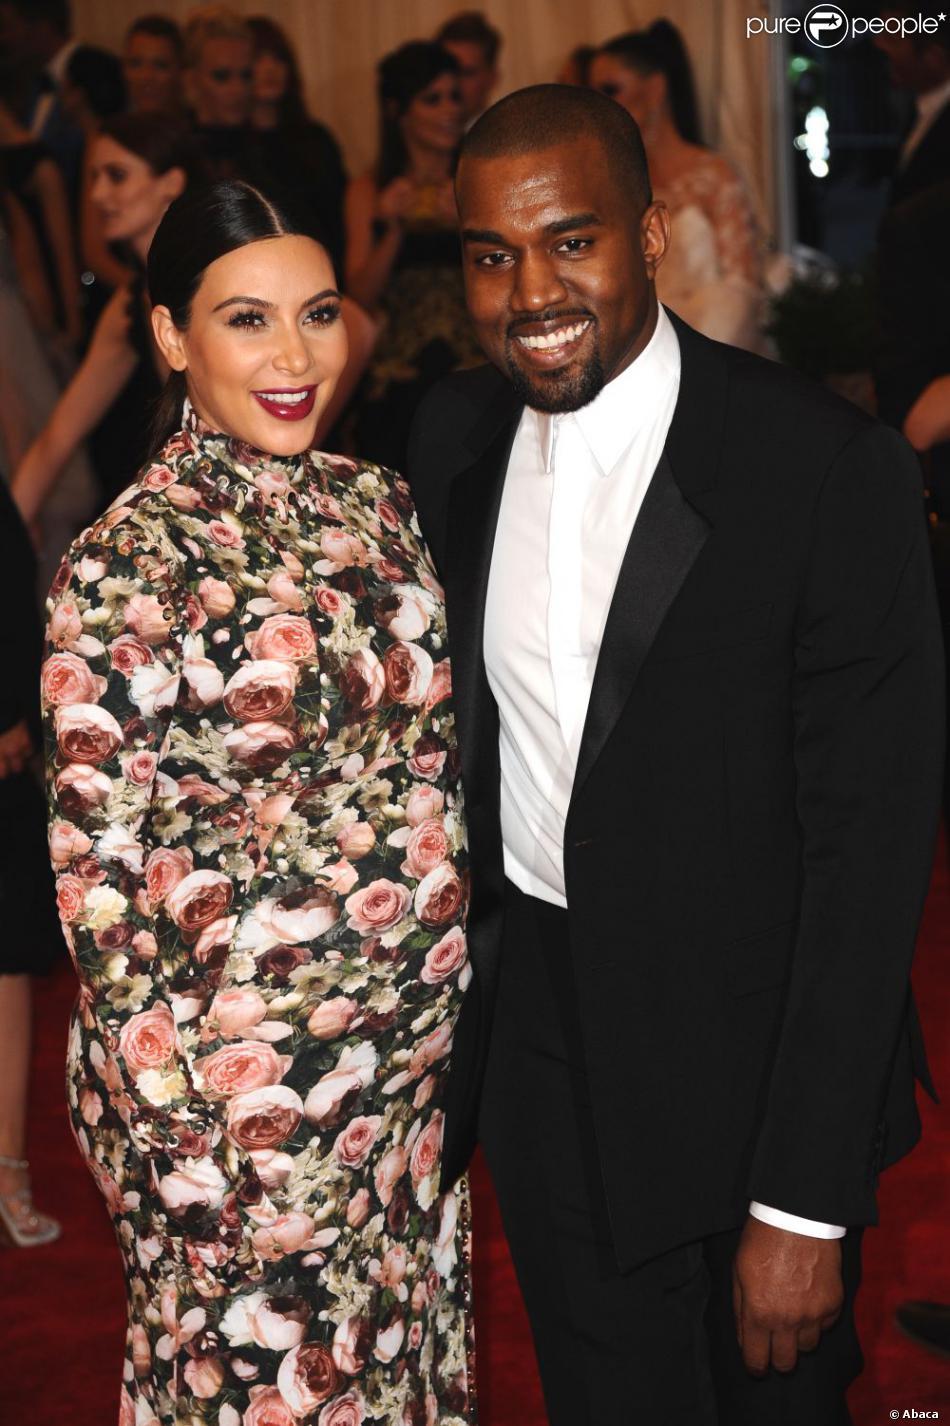 Kim Kardashian et Kanye West au MET Gala à New York, le 6 mai 2013.